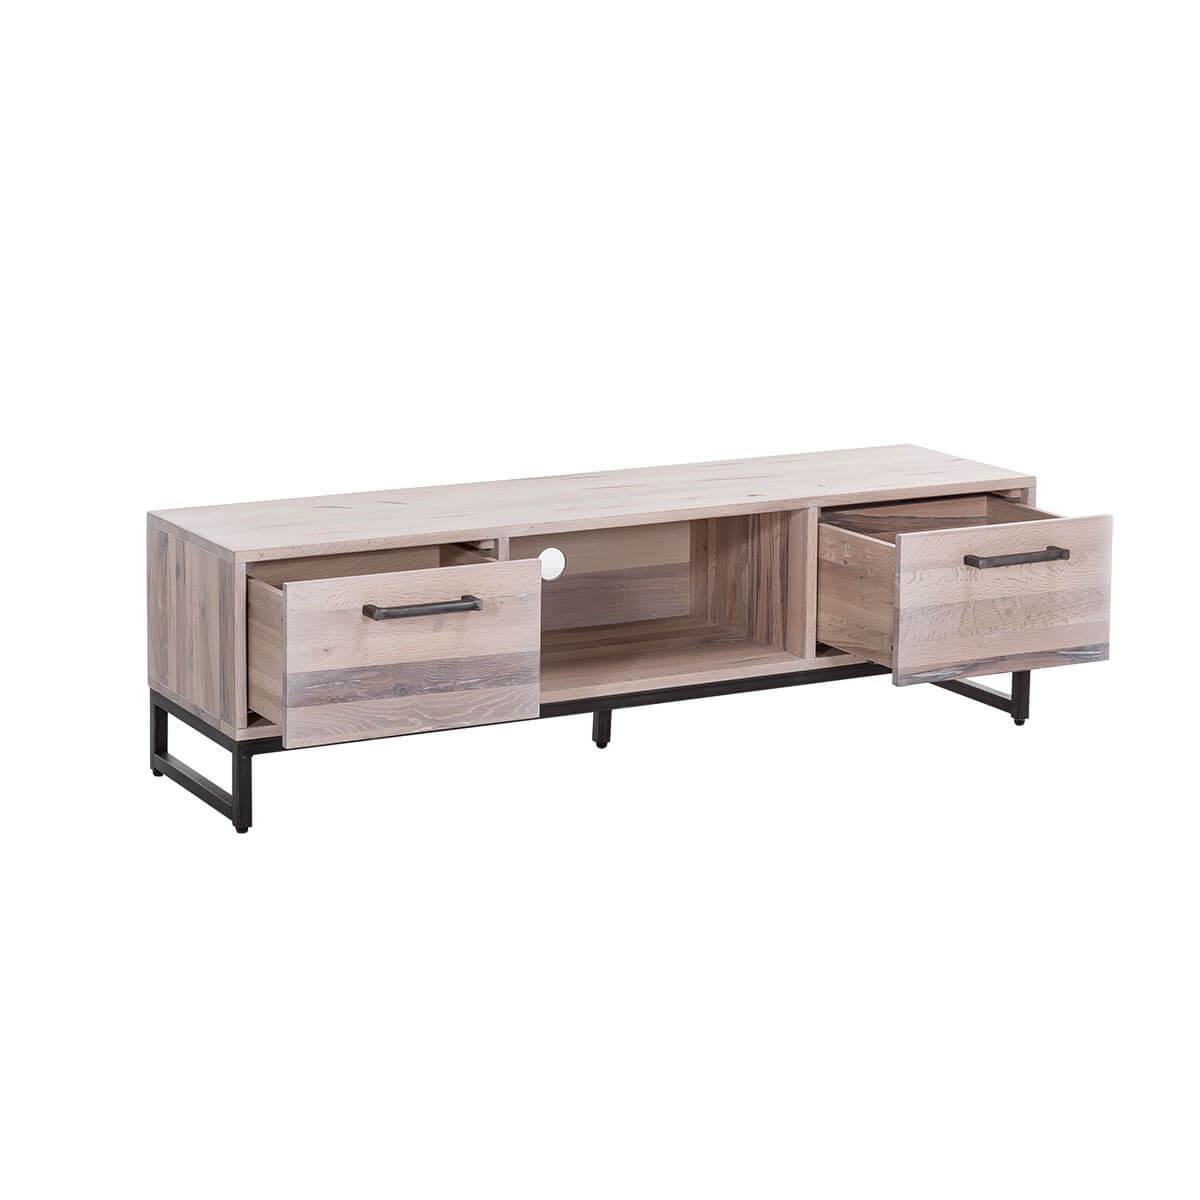 tv board lowboard eiche massiv weiss ge lt fernsehschrank. Black Bedroom Furniture Sets. Home Design Ideas